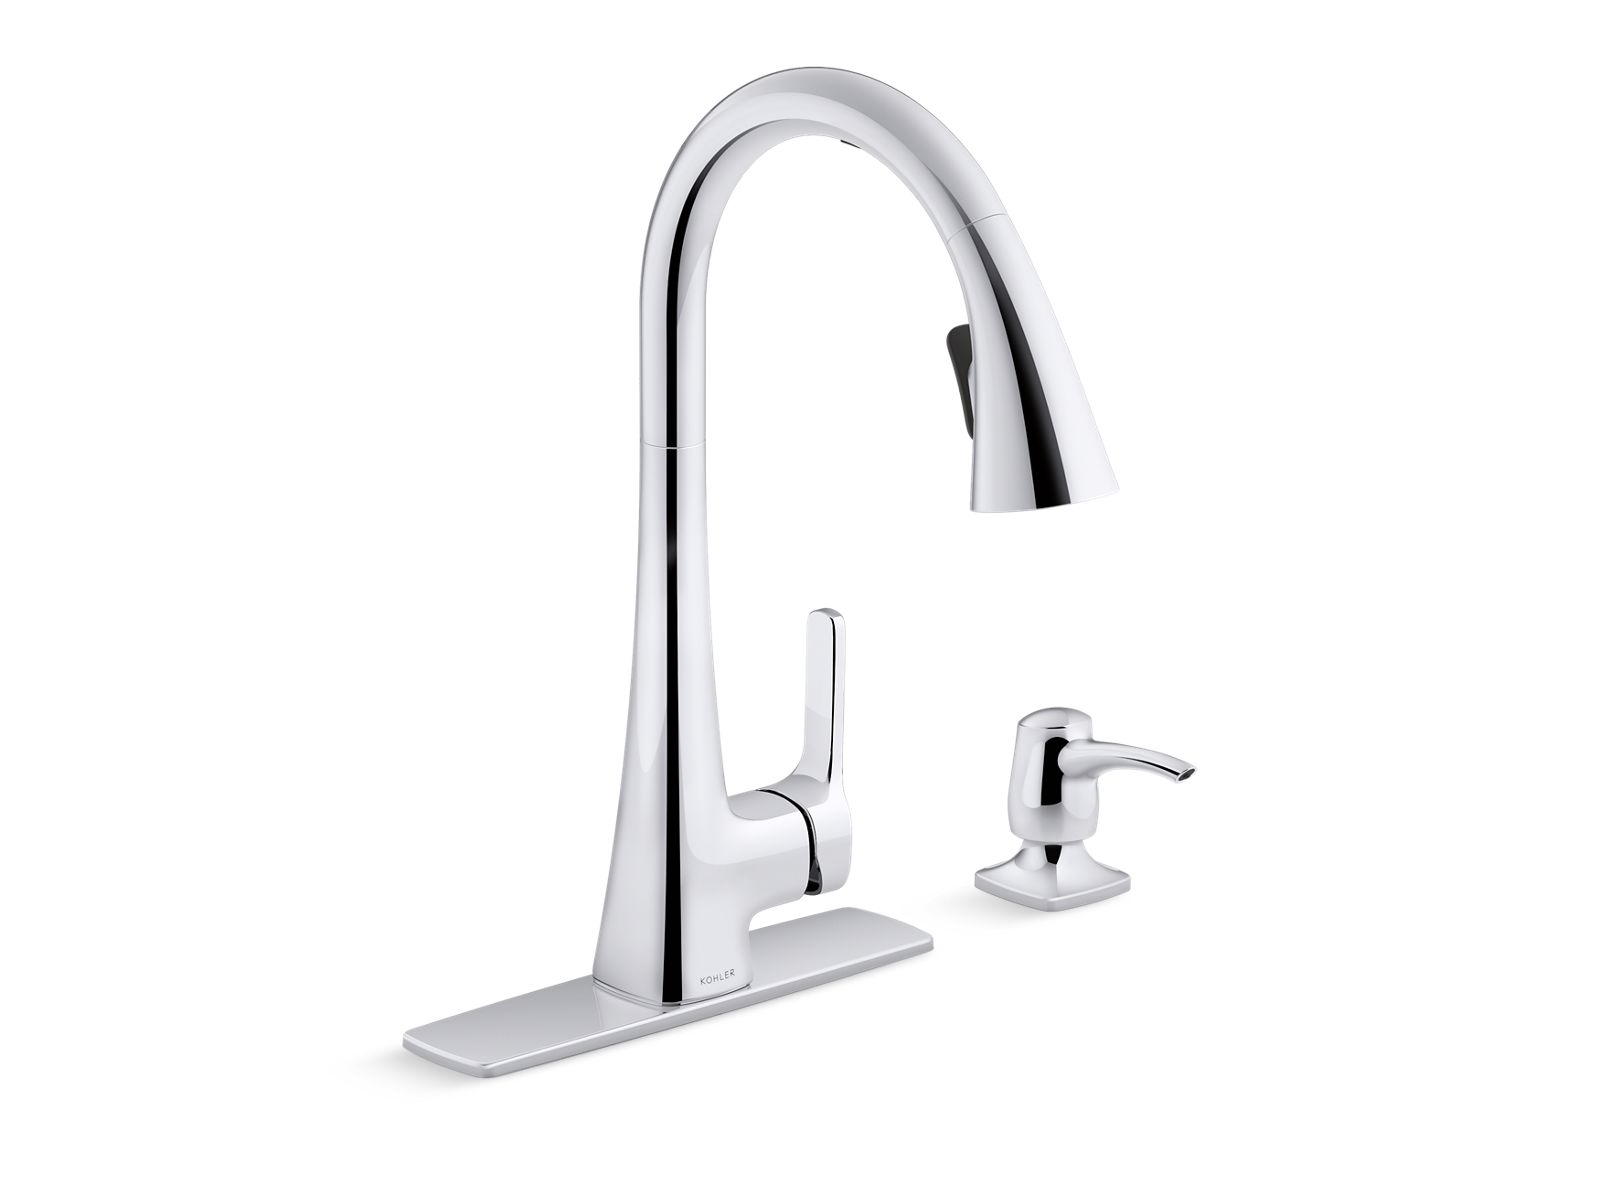 k r26281 sd maxton touchless pull down kitchen faucet kohler